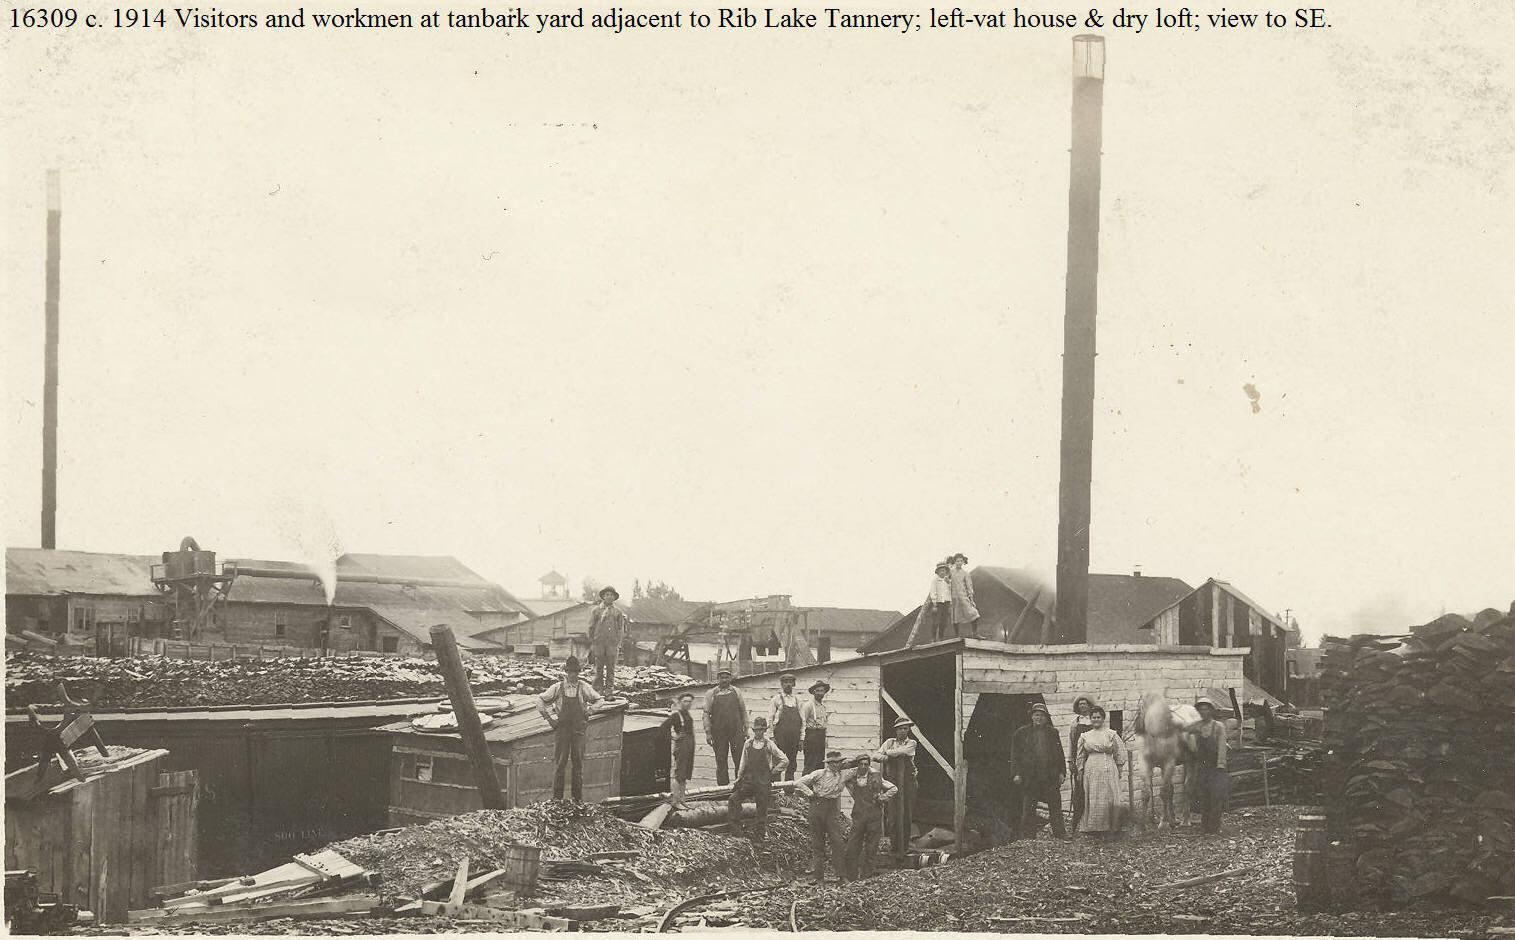 C:\Users\Robert P. Rusch\Desktop\II. RLHSoc\Documents & Photos-Scanned\Rib Lake History 16300-16399\16309 P. c. 1914 Rib Lake Tannery; right-tanbark; center-boiler house; left-vat house; view SW.jpg